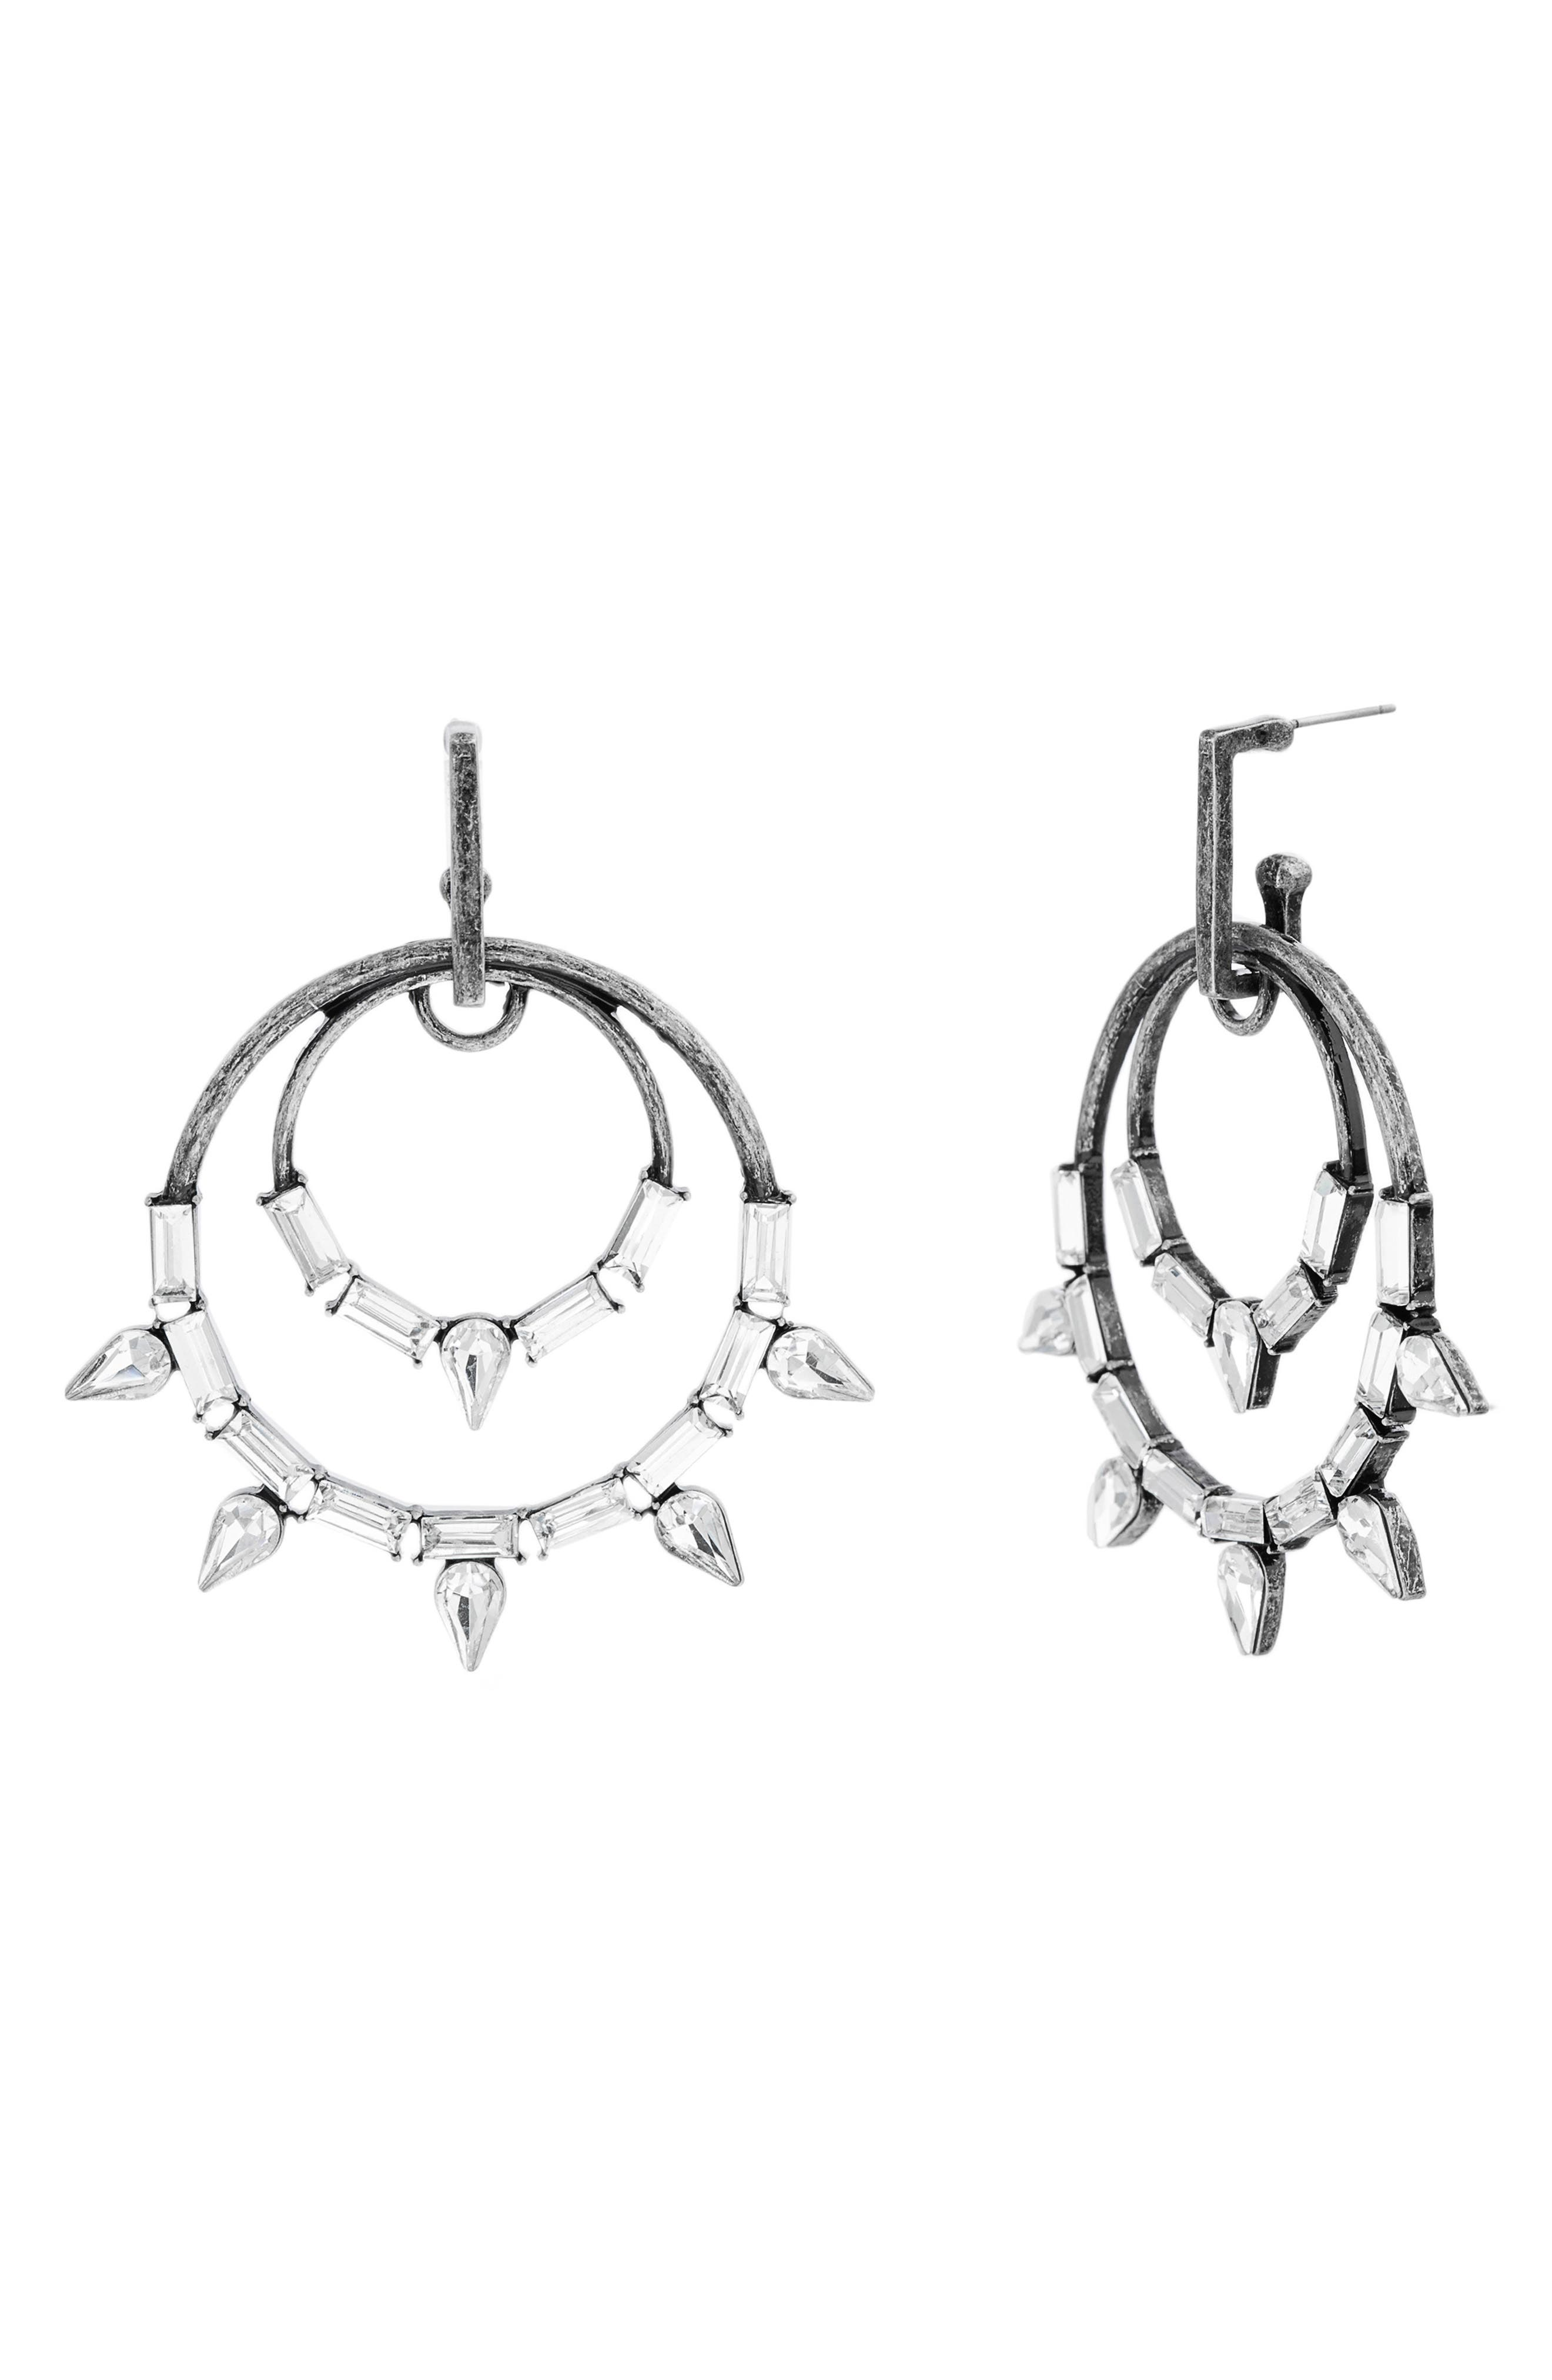 Image of Steve Madden Baguette Stone Casted Double Hoop Earrings